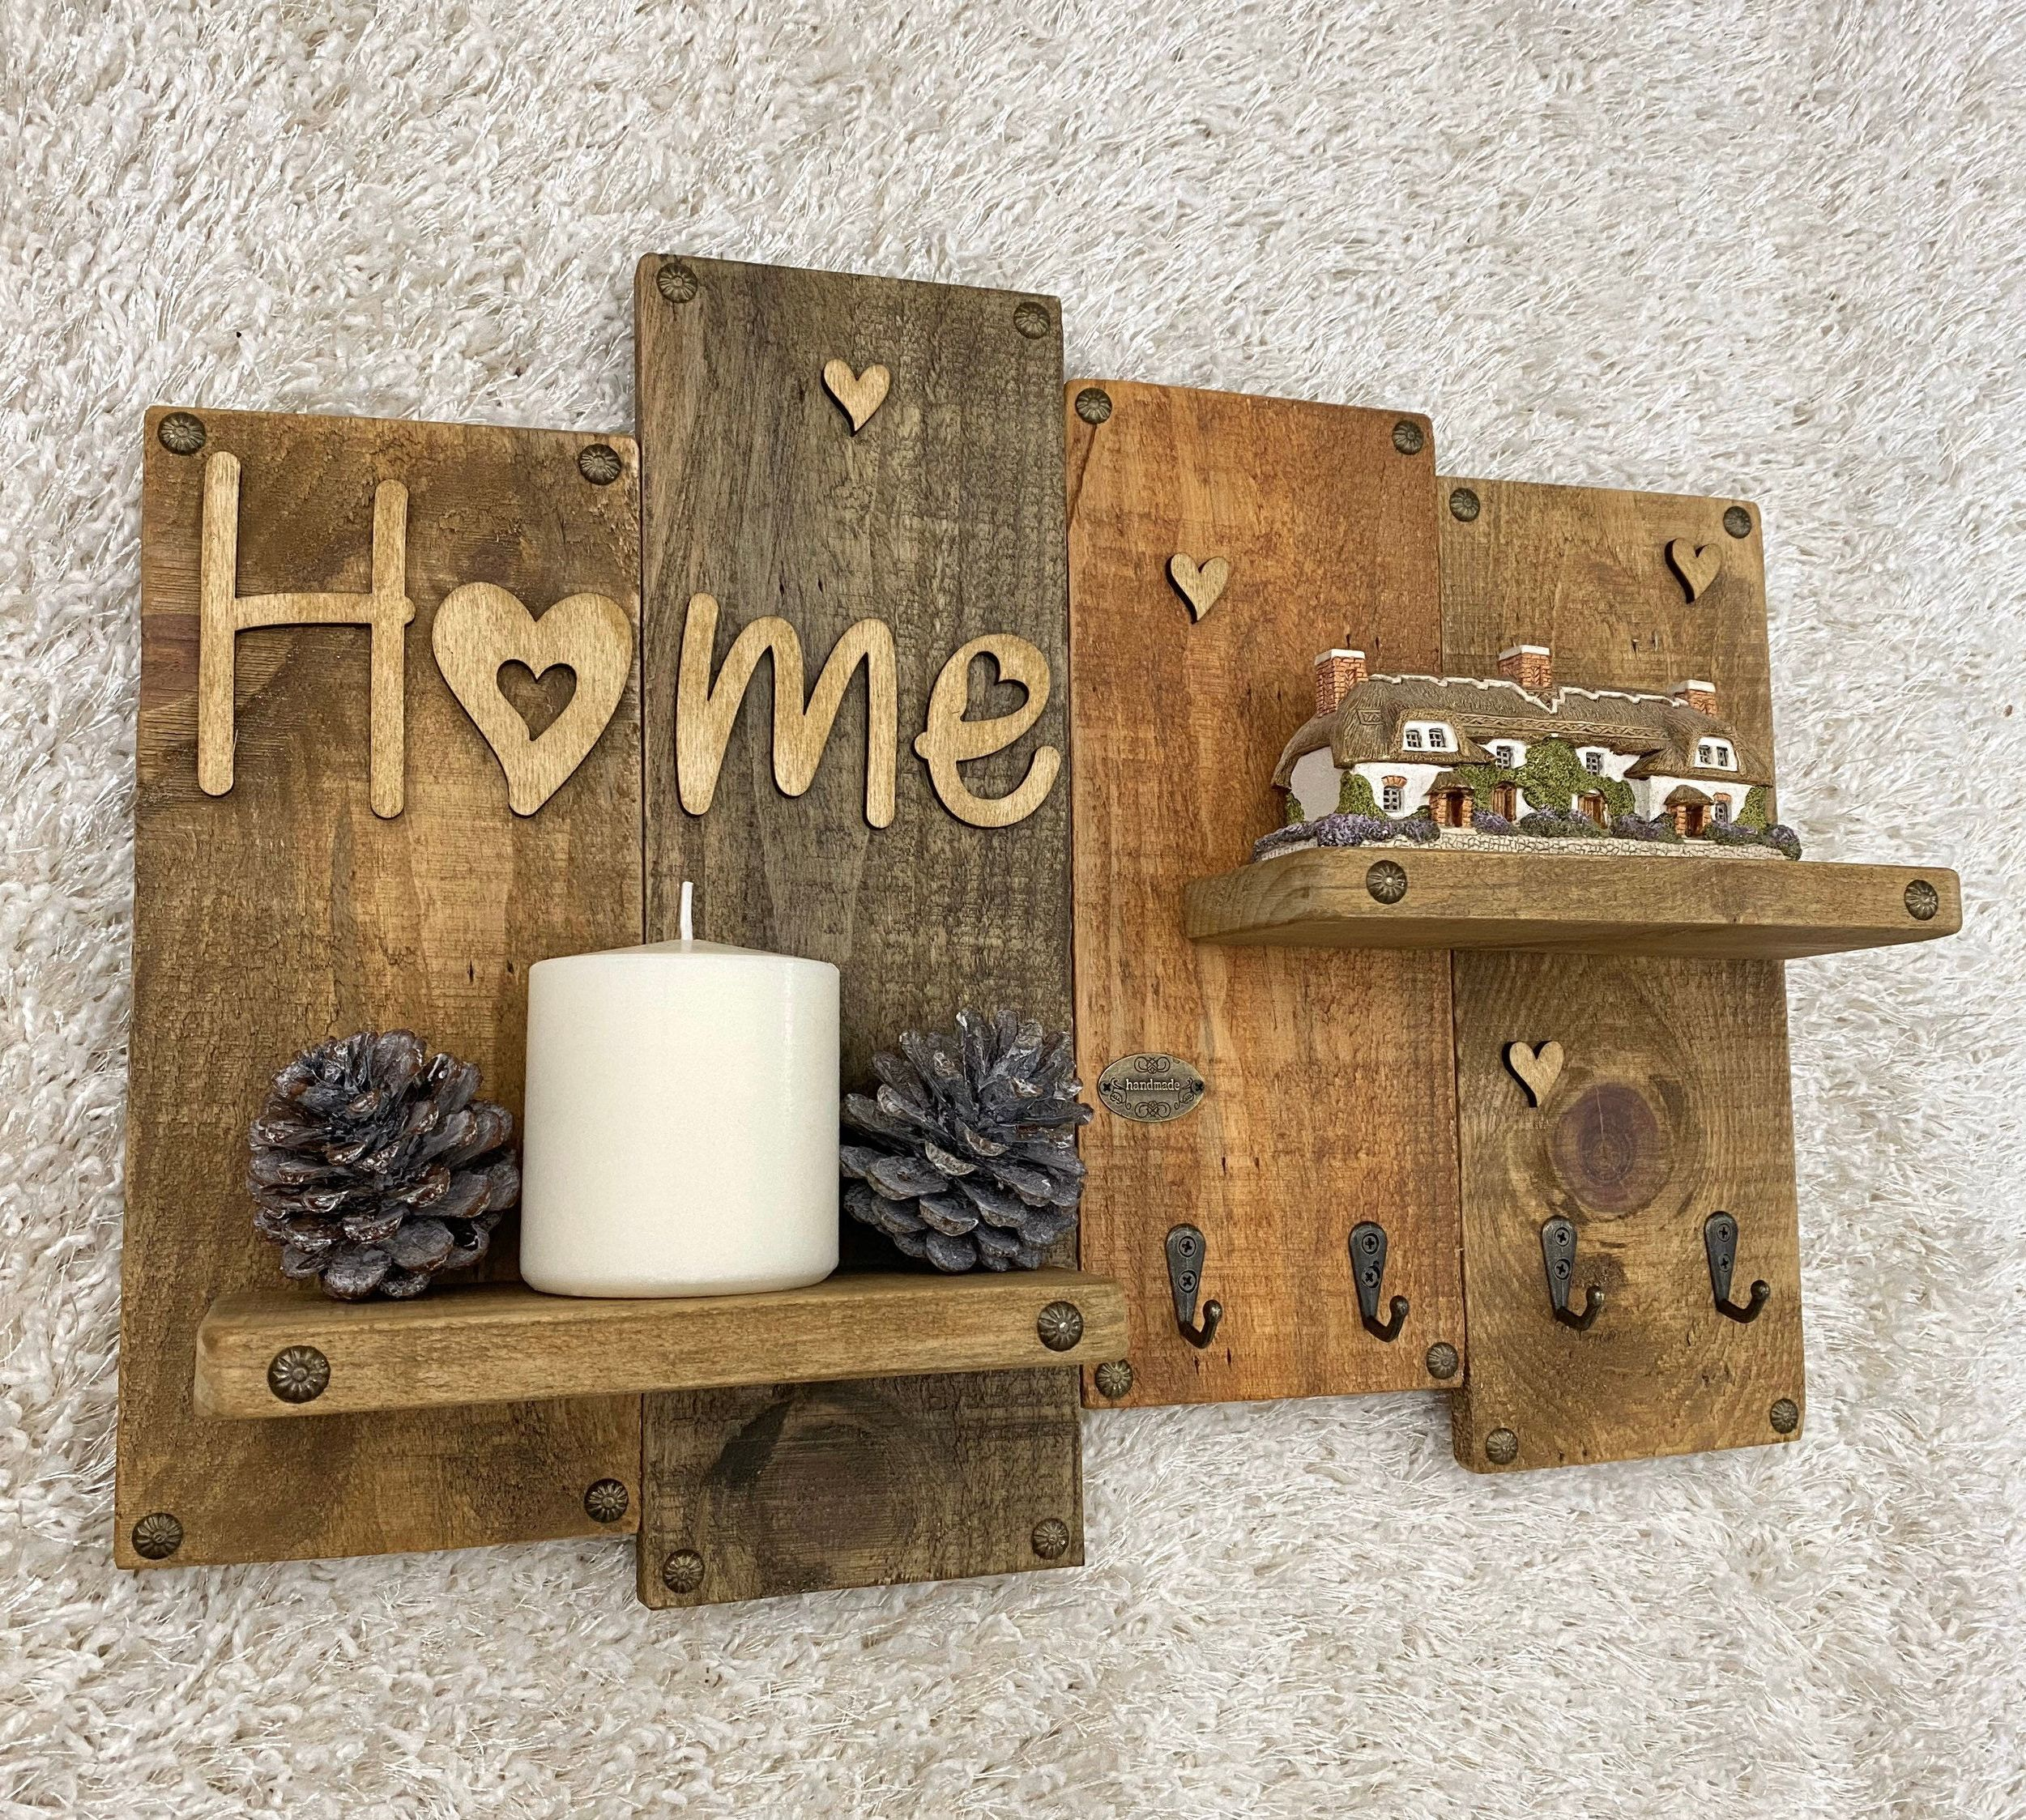 Handmade Wooden Shelf Key Holder Organiser Home Hook Tack Rustic Farmhouse Decor Art Vintage In 2020 Handmade Wooden Rustic Farmhouse Decor Wooden Shelves